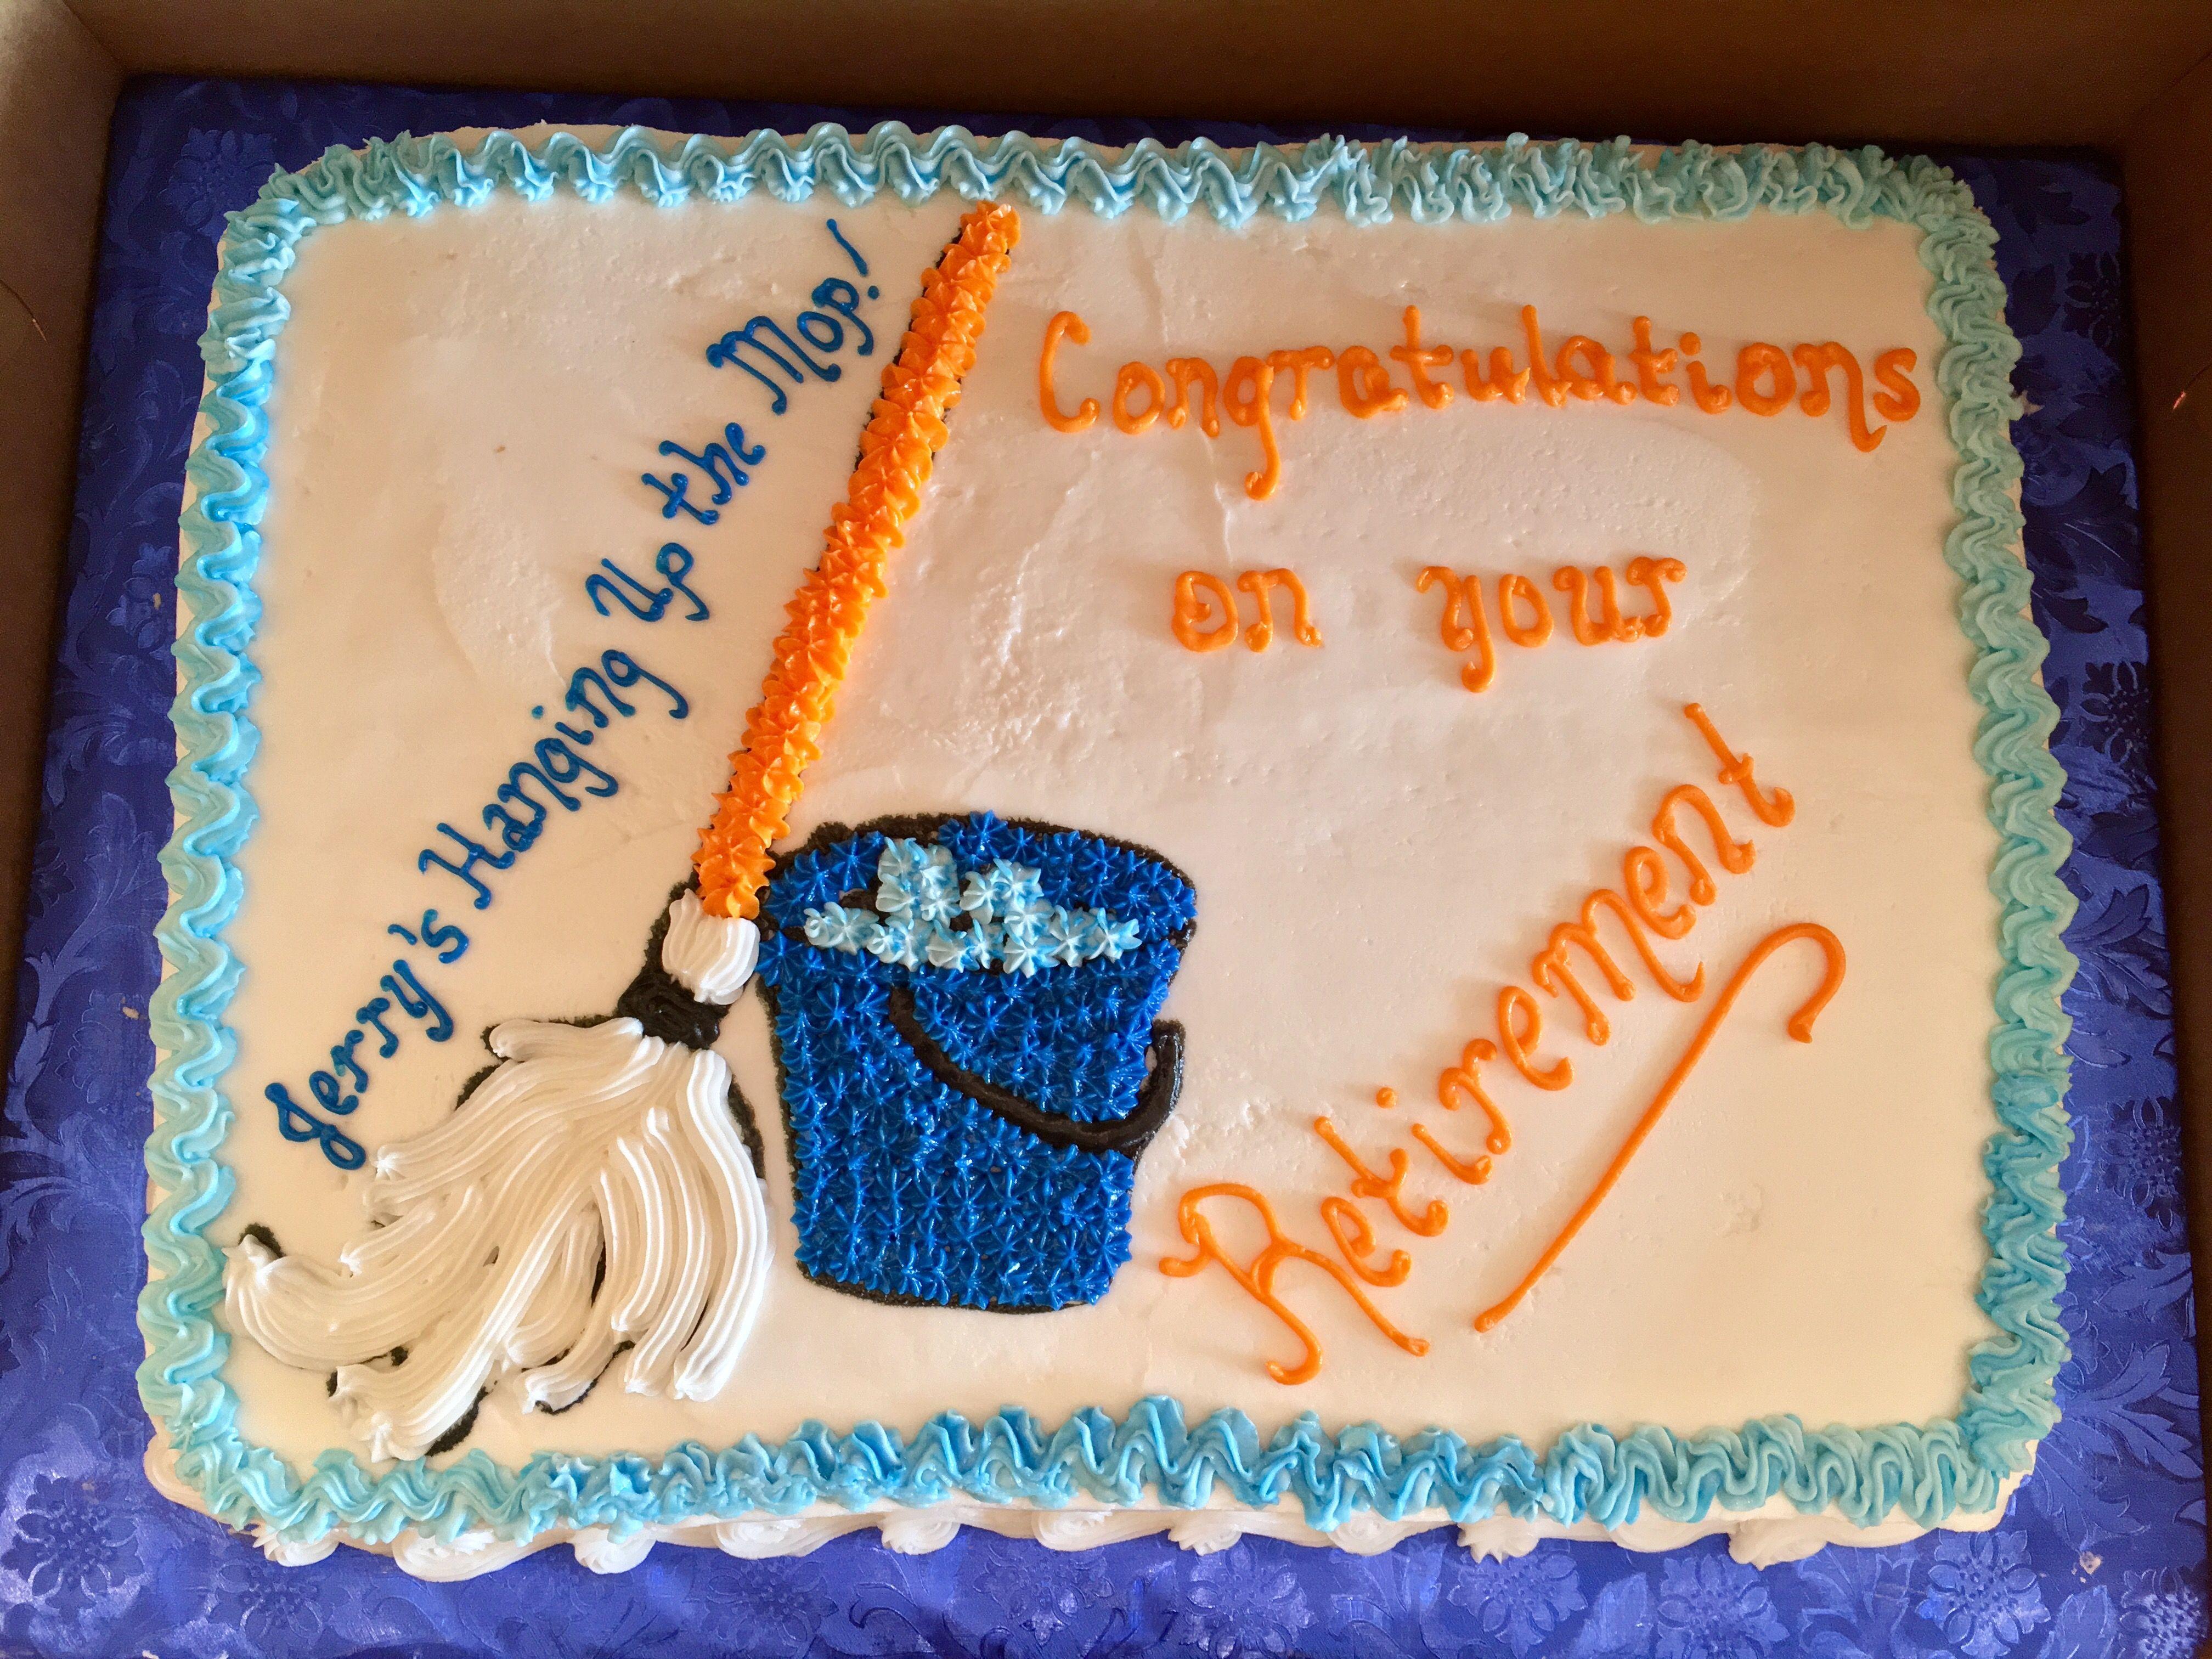 Janitor Retirement Cake